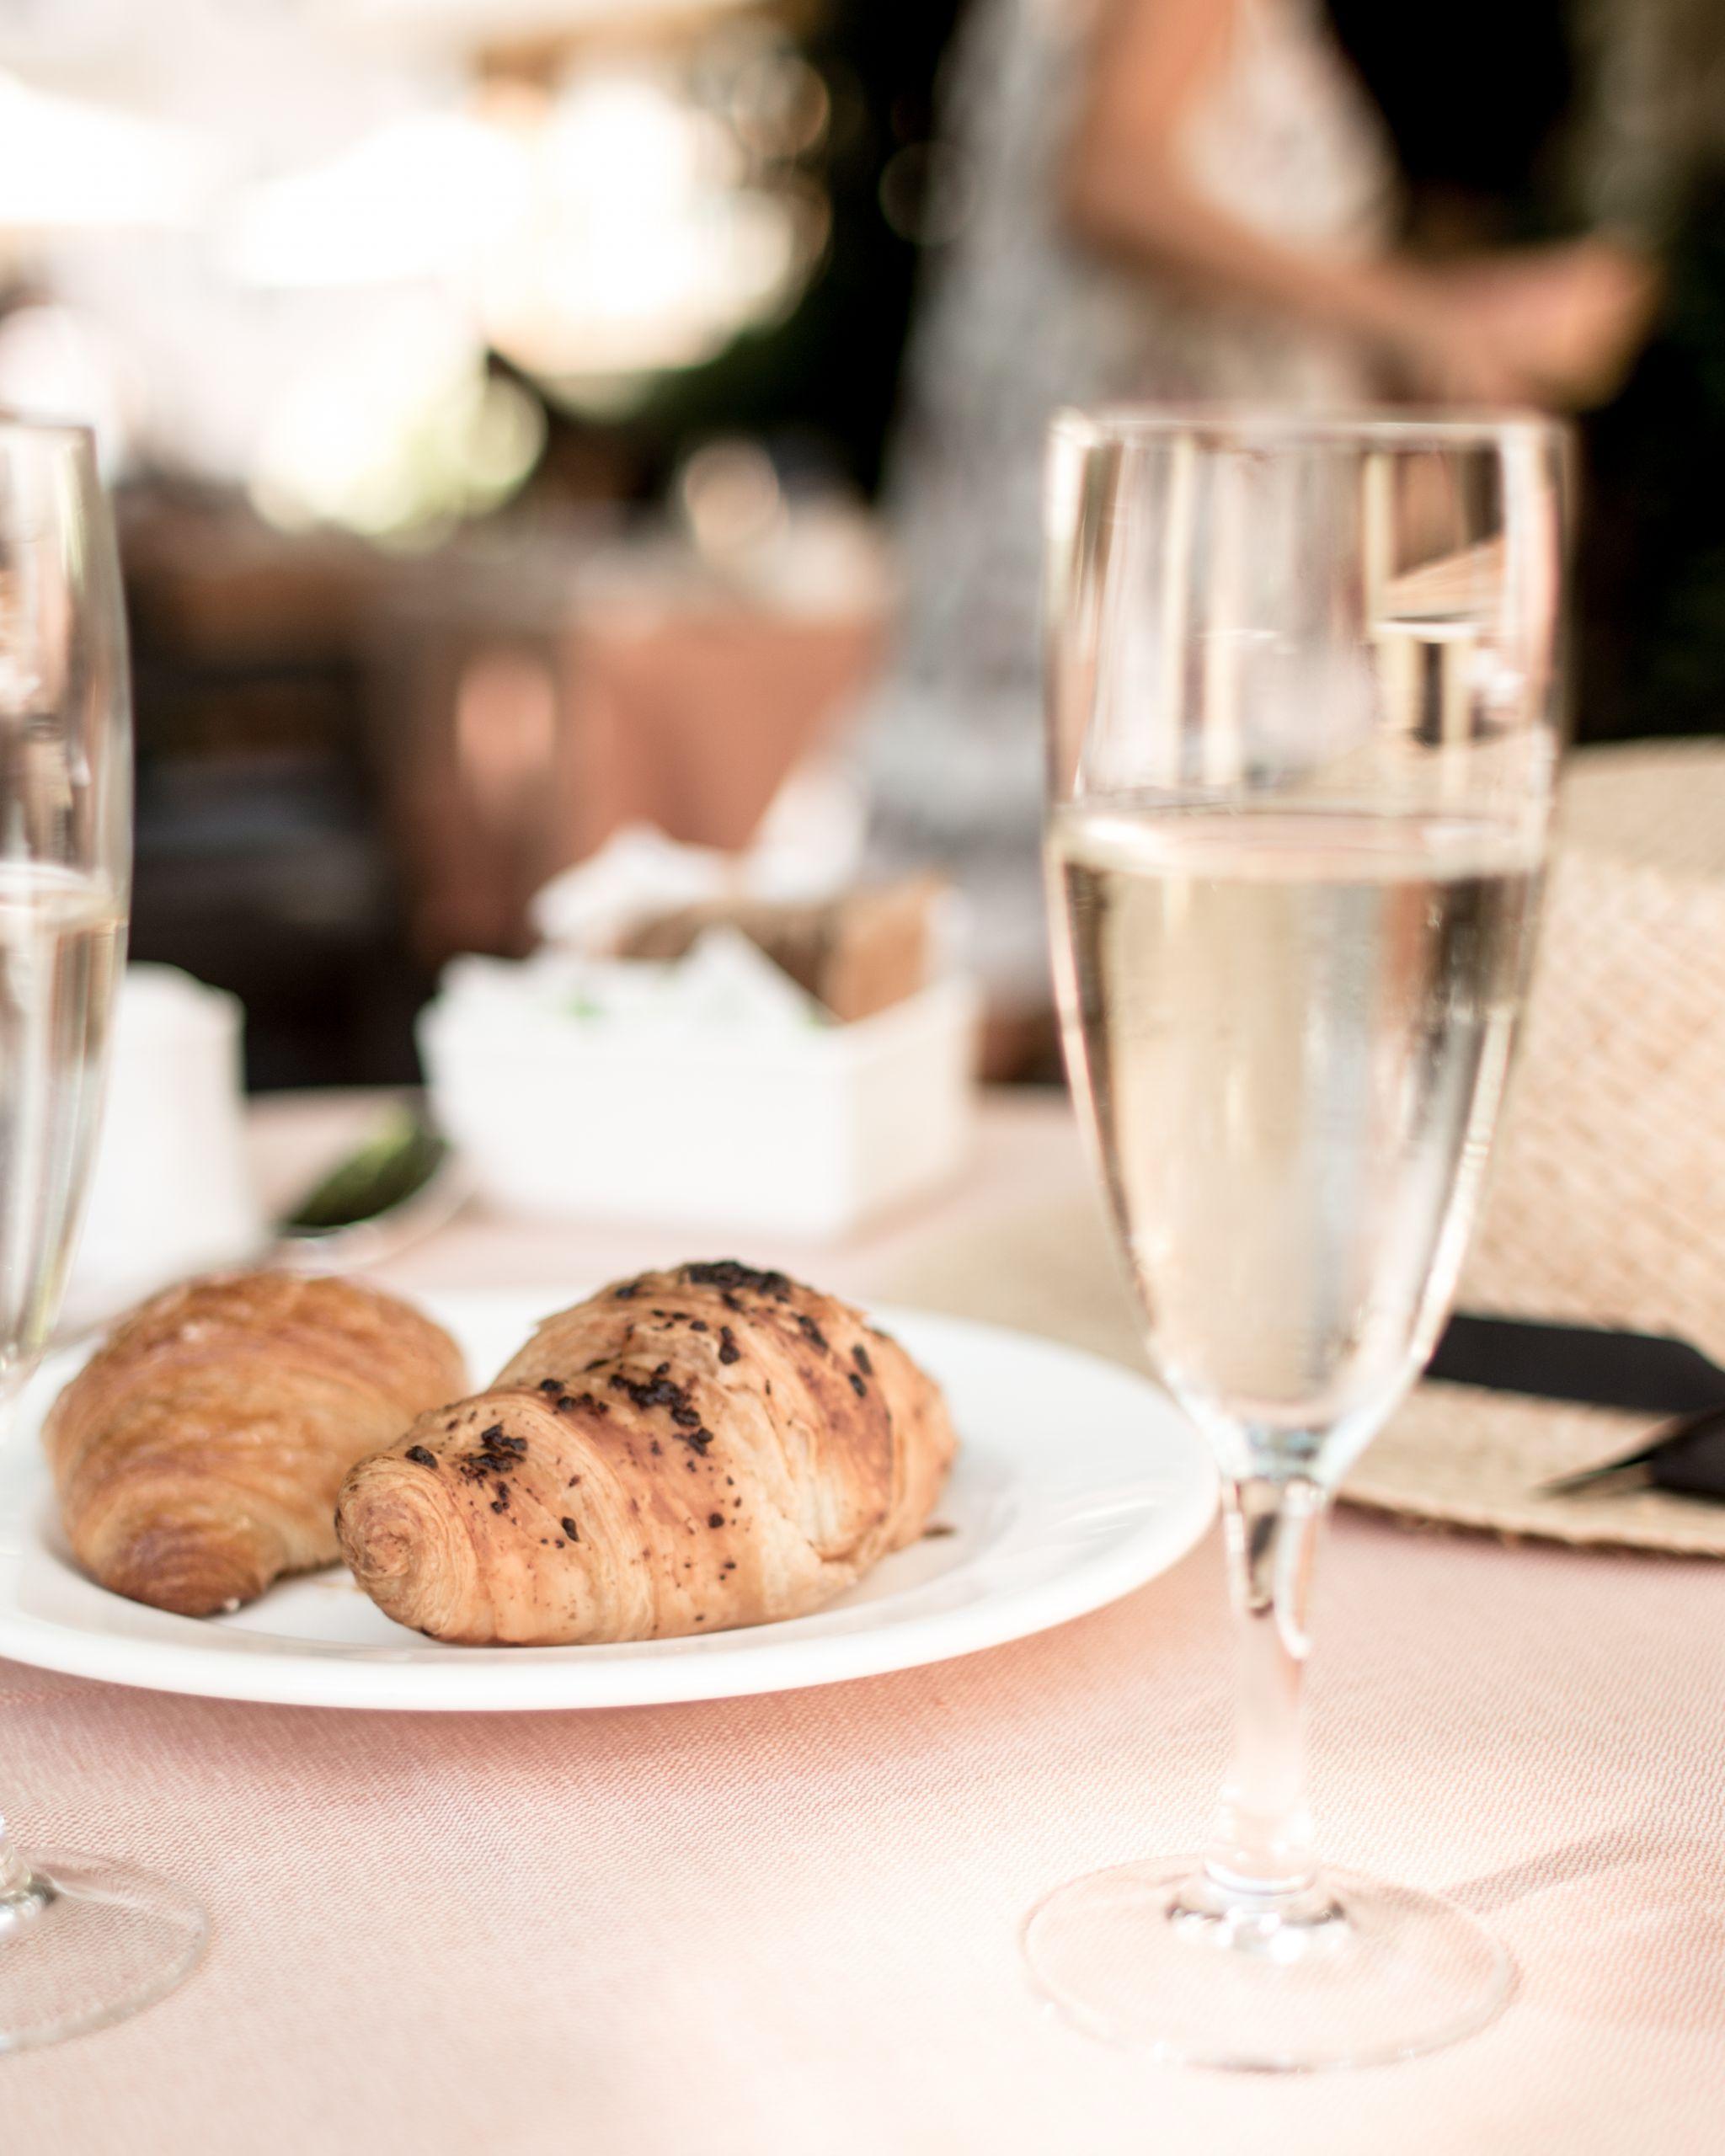 Adler Dolomites Ortisei Italy Hospitality Brand Photography Breakfast Croissant_